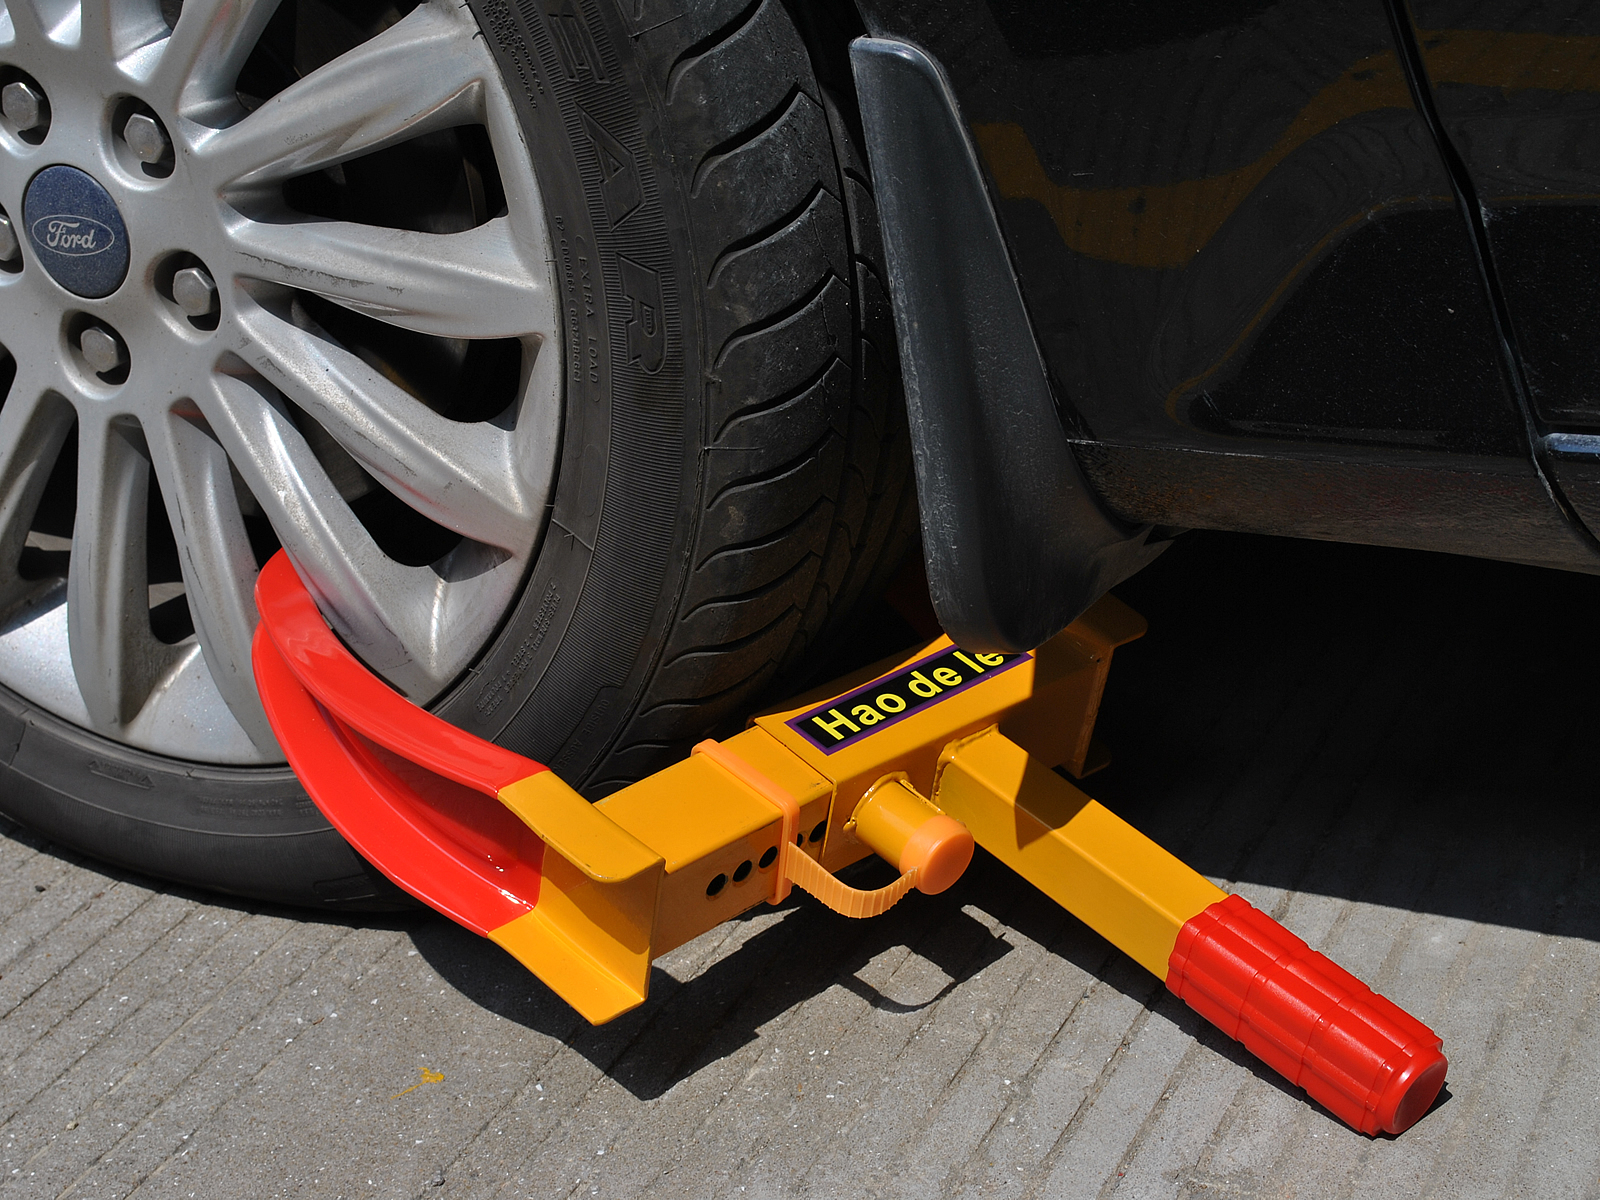 Costway Wheel Lock Clamp Boot Tire Claw Auto Car Truck Rv Boat